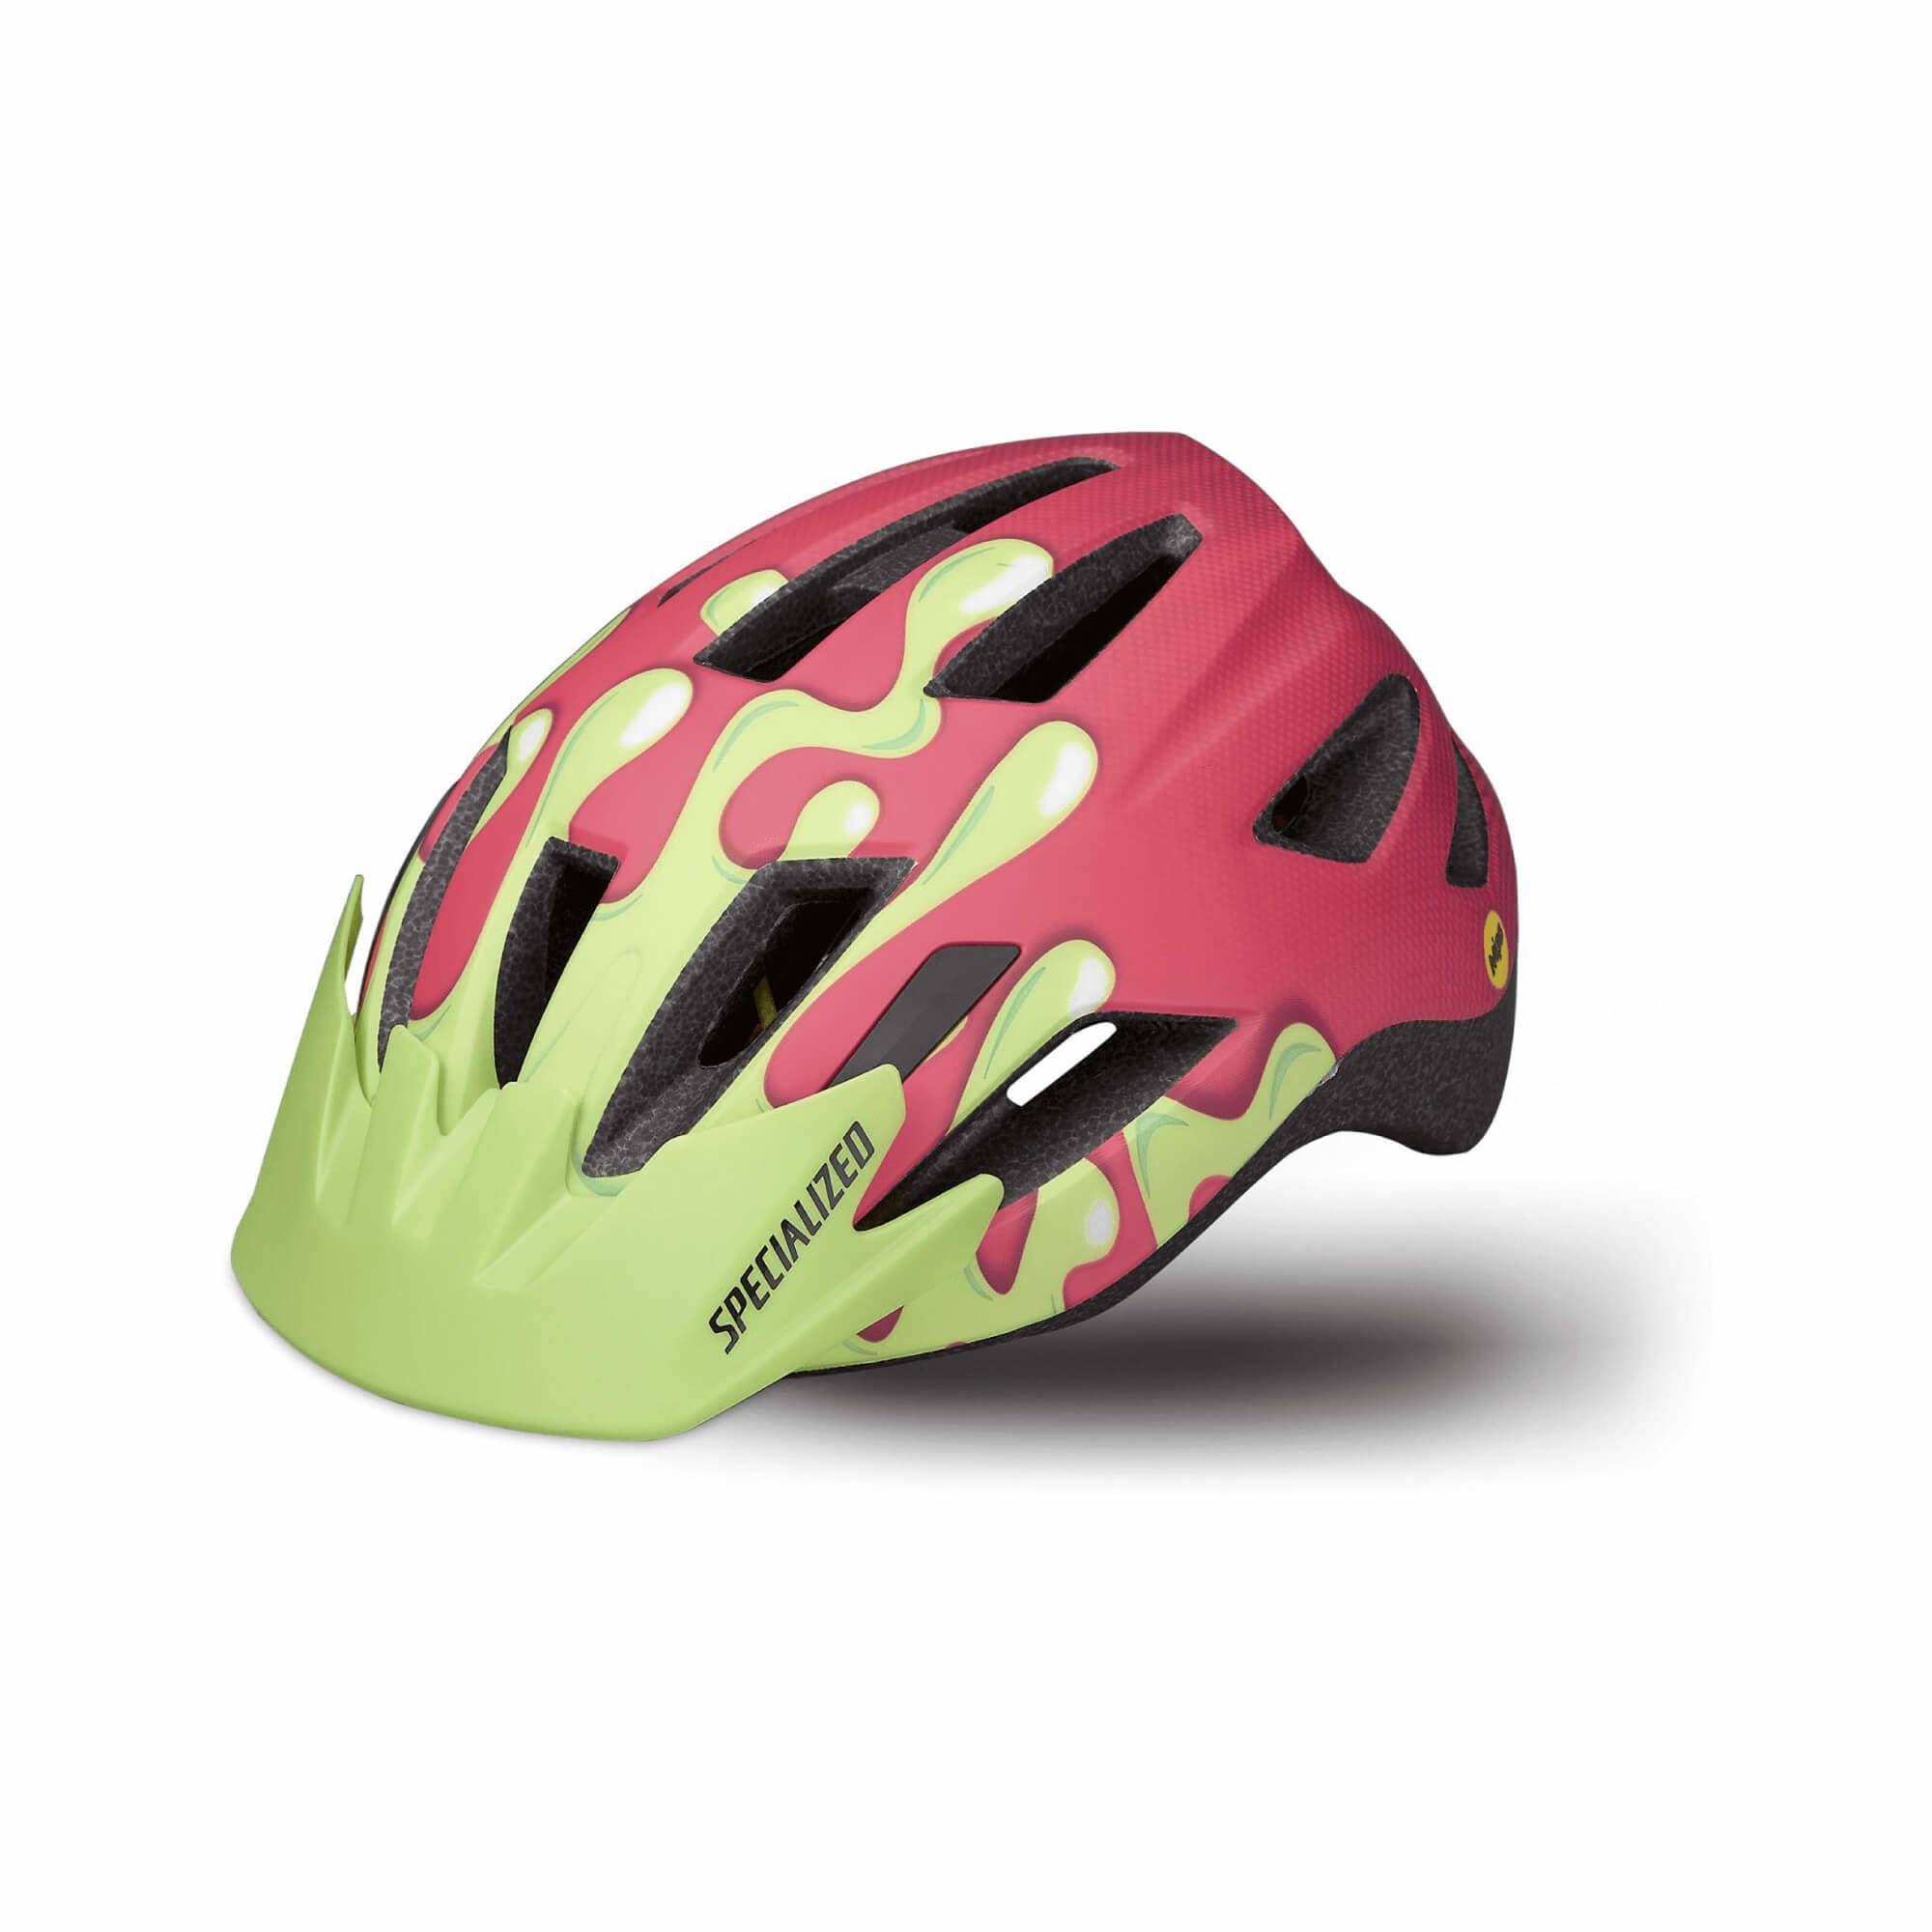 Shuffle Led SB Helmet Mips Youth-1